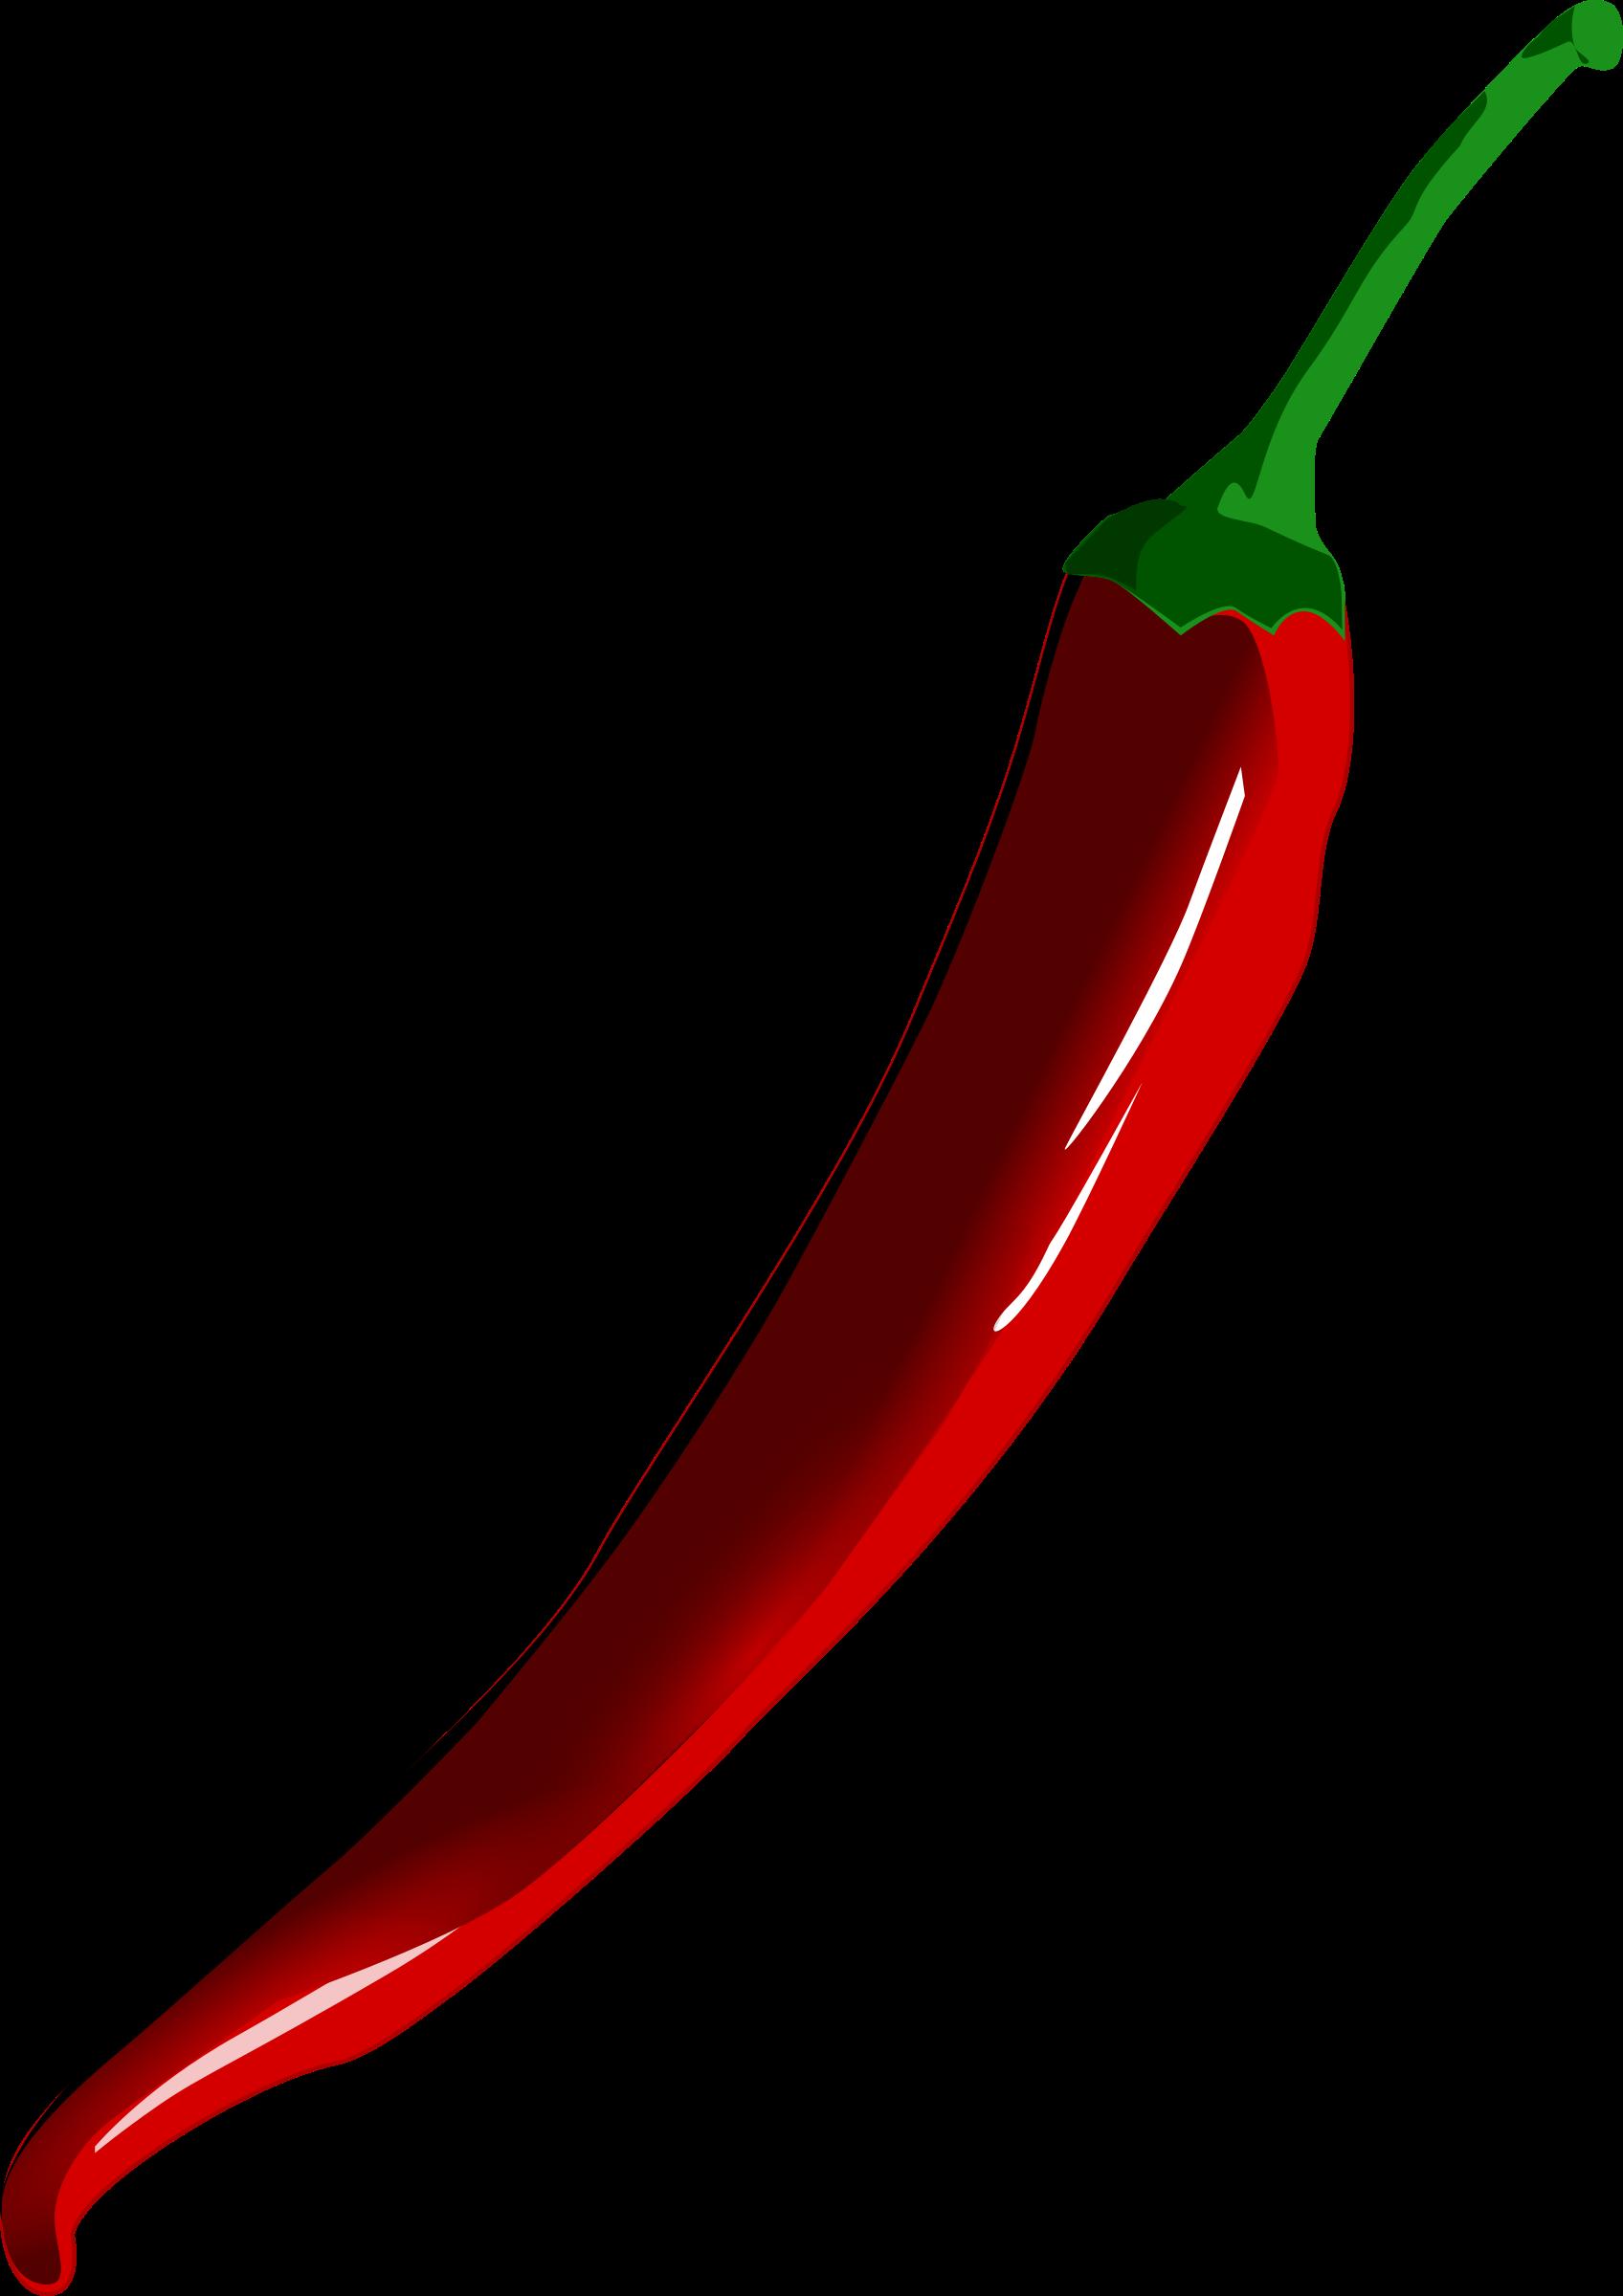 Chili big image png. Pepper clipart sili